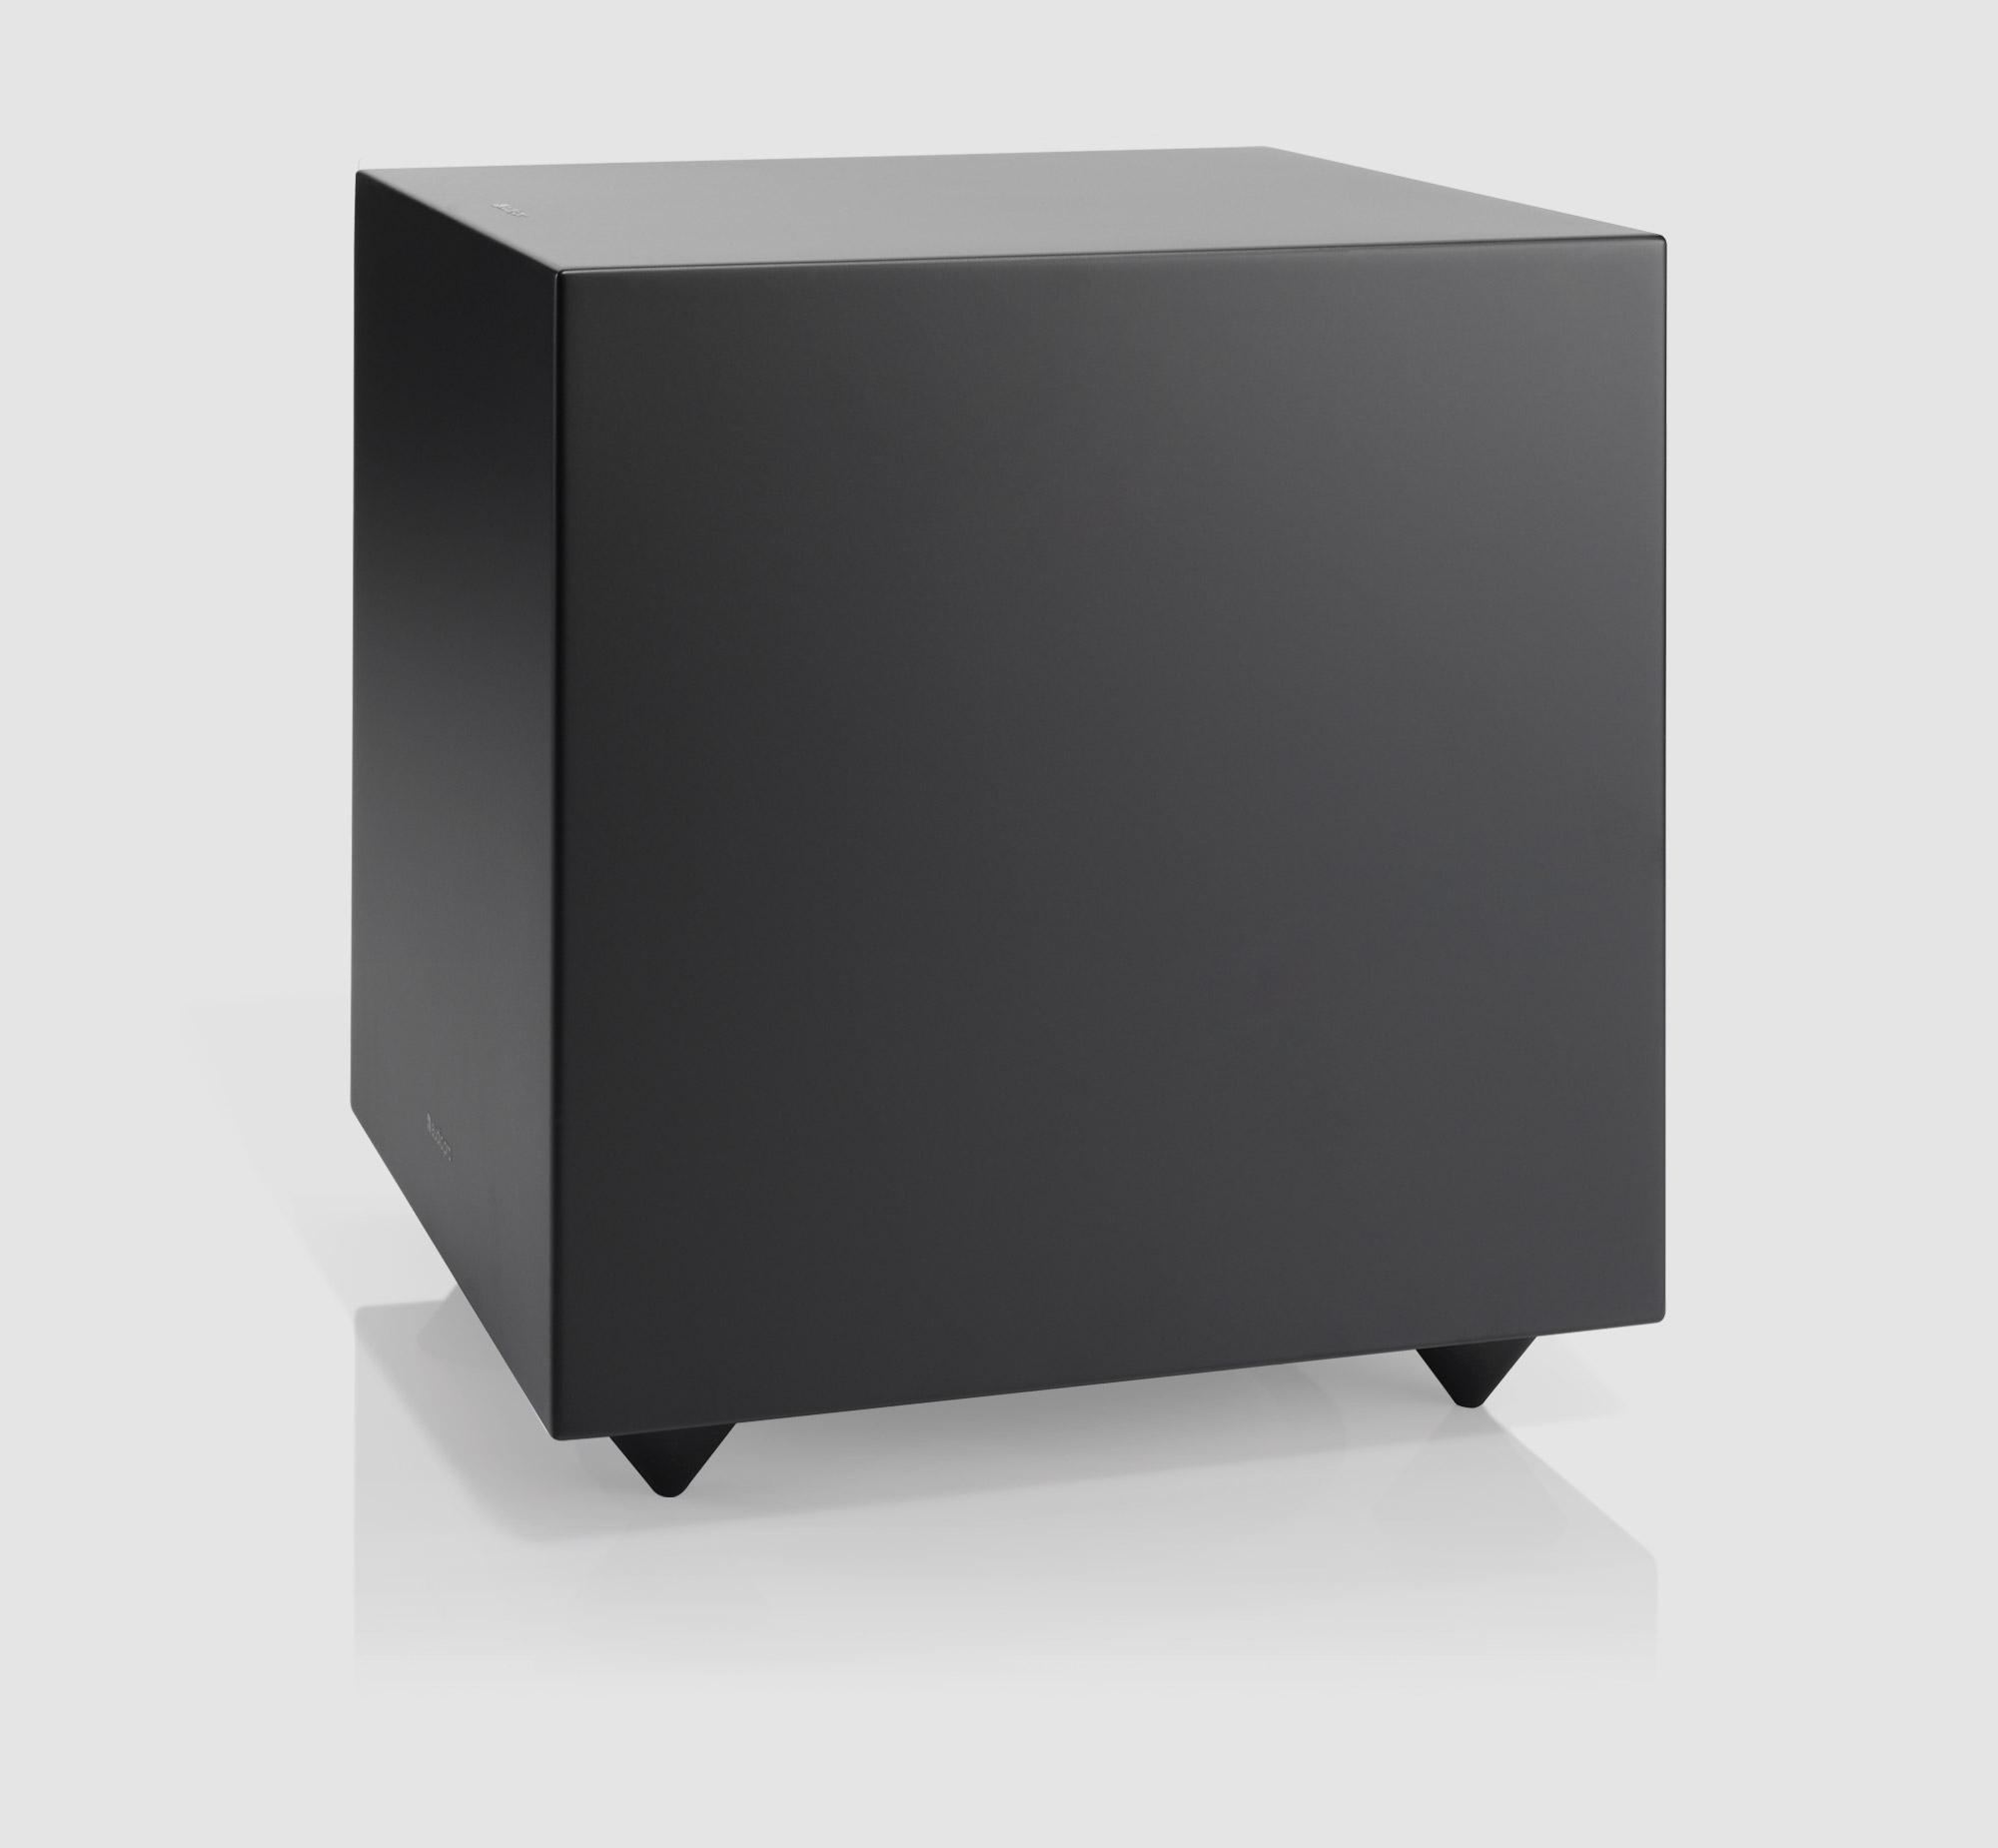 audio pro subwoofer internet ja tietokoneet. Black Bedroom Furniture Sets. Home Design Ideas